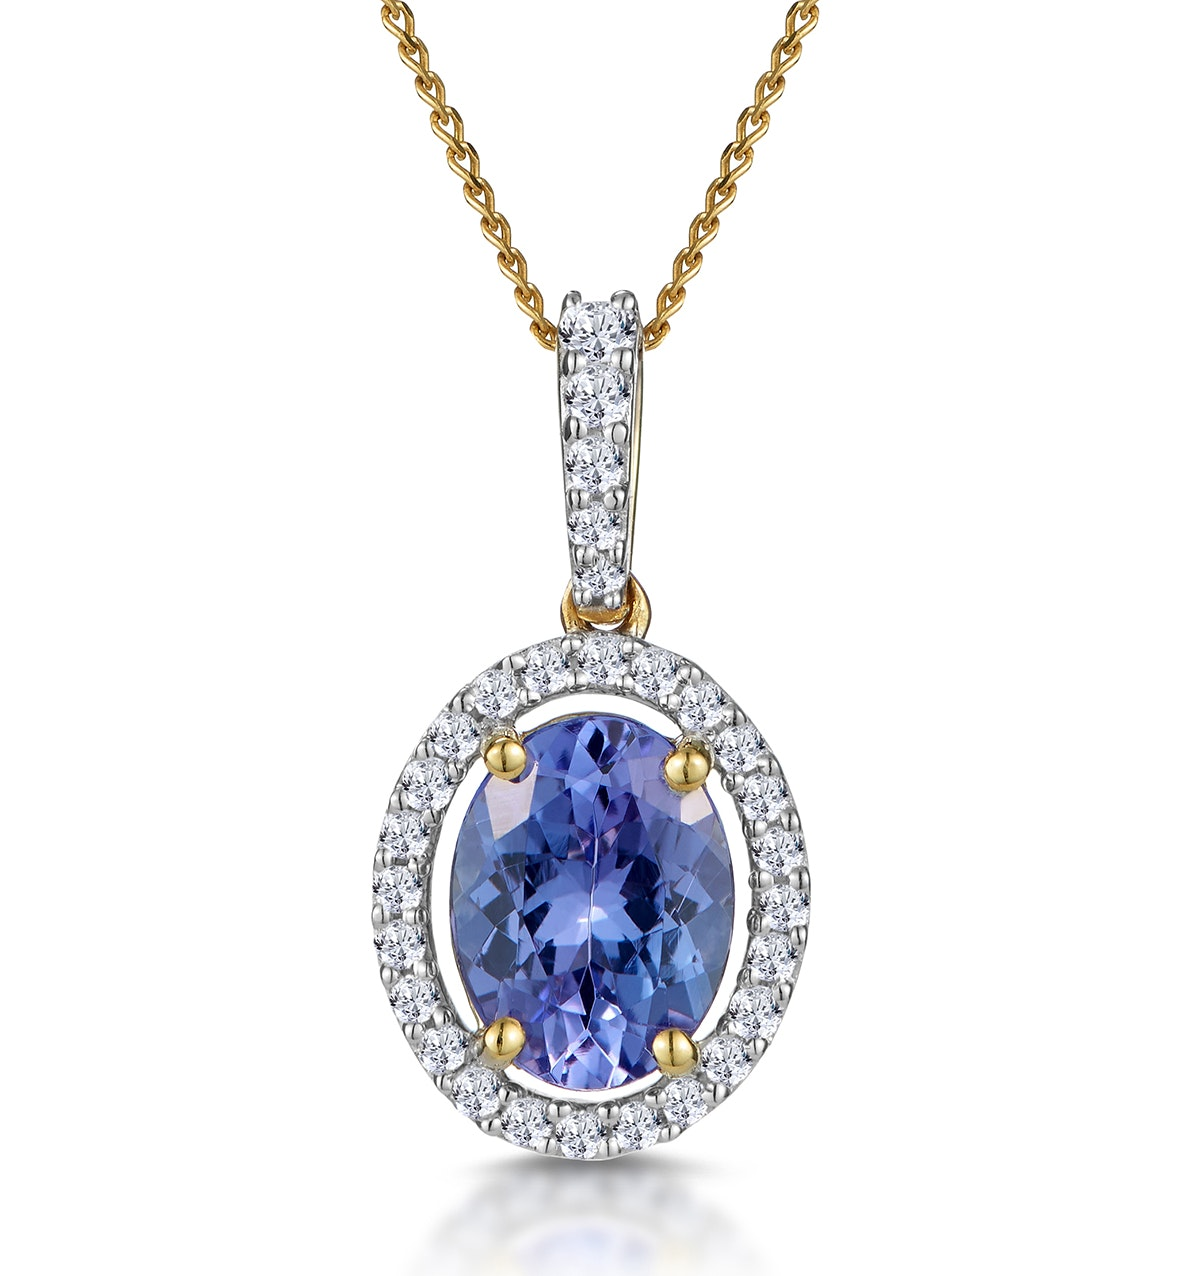 1ct Tanzanite and Diamond Halo Oval Asteria  Necklace in 18K Gold